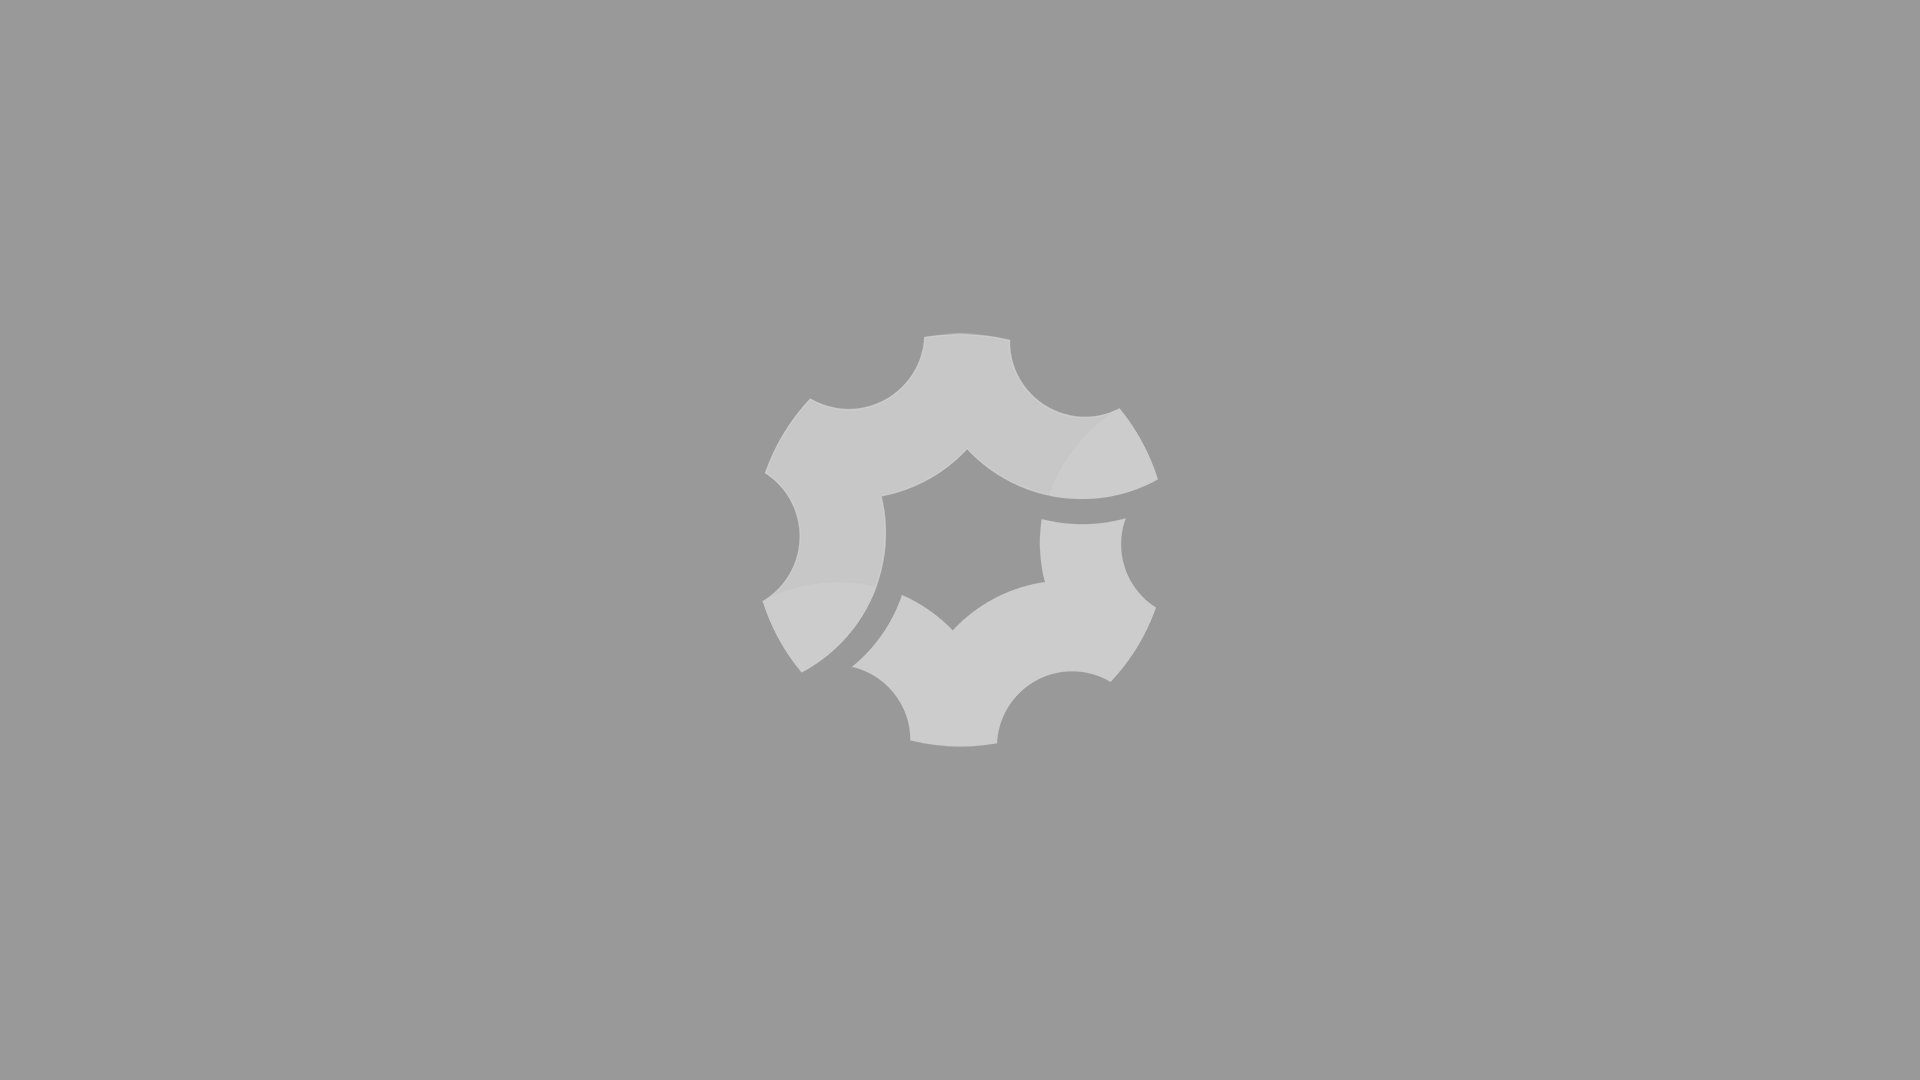 new_bitmap_image.jpg